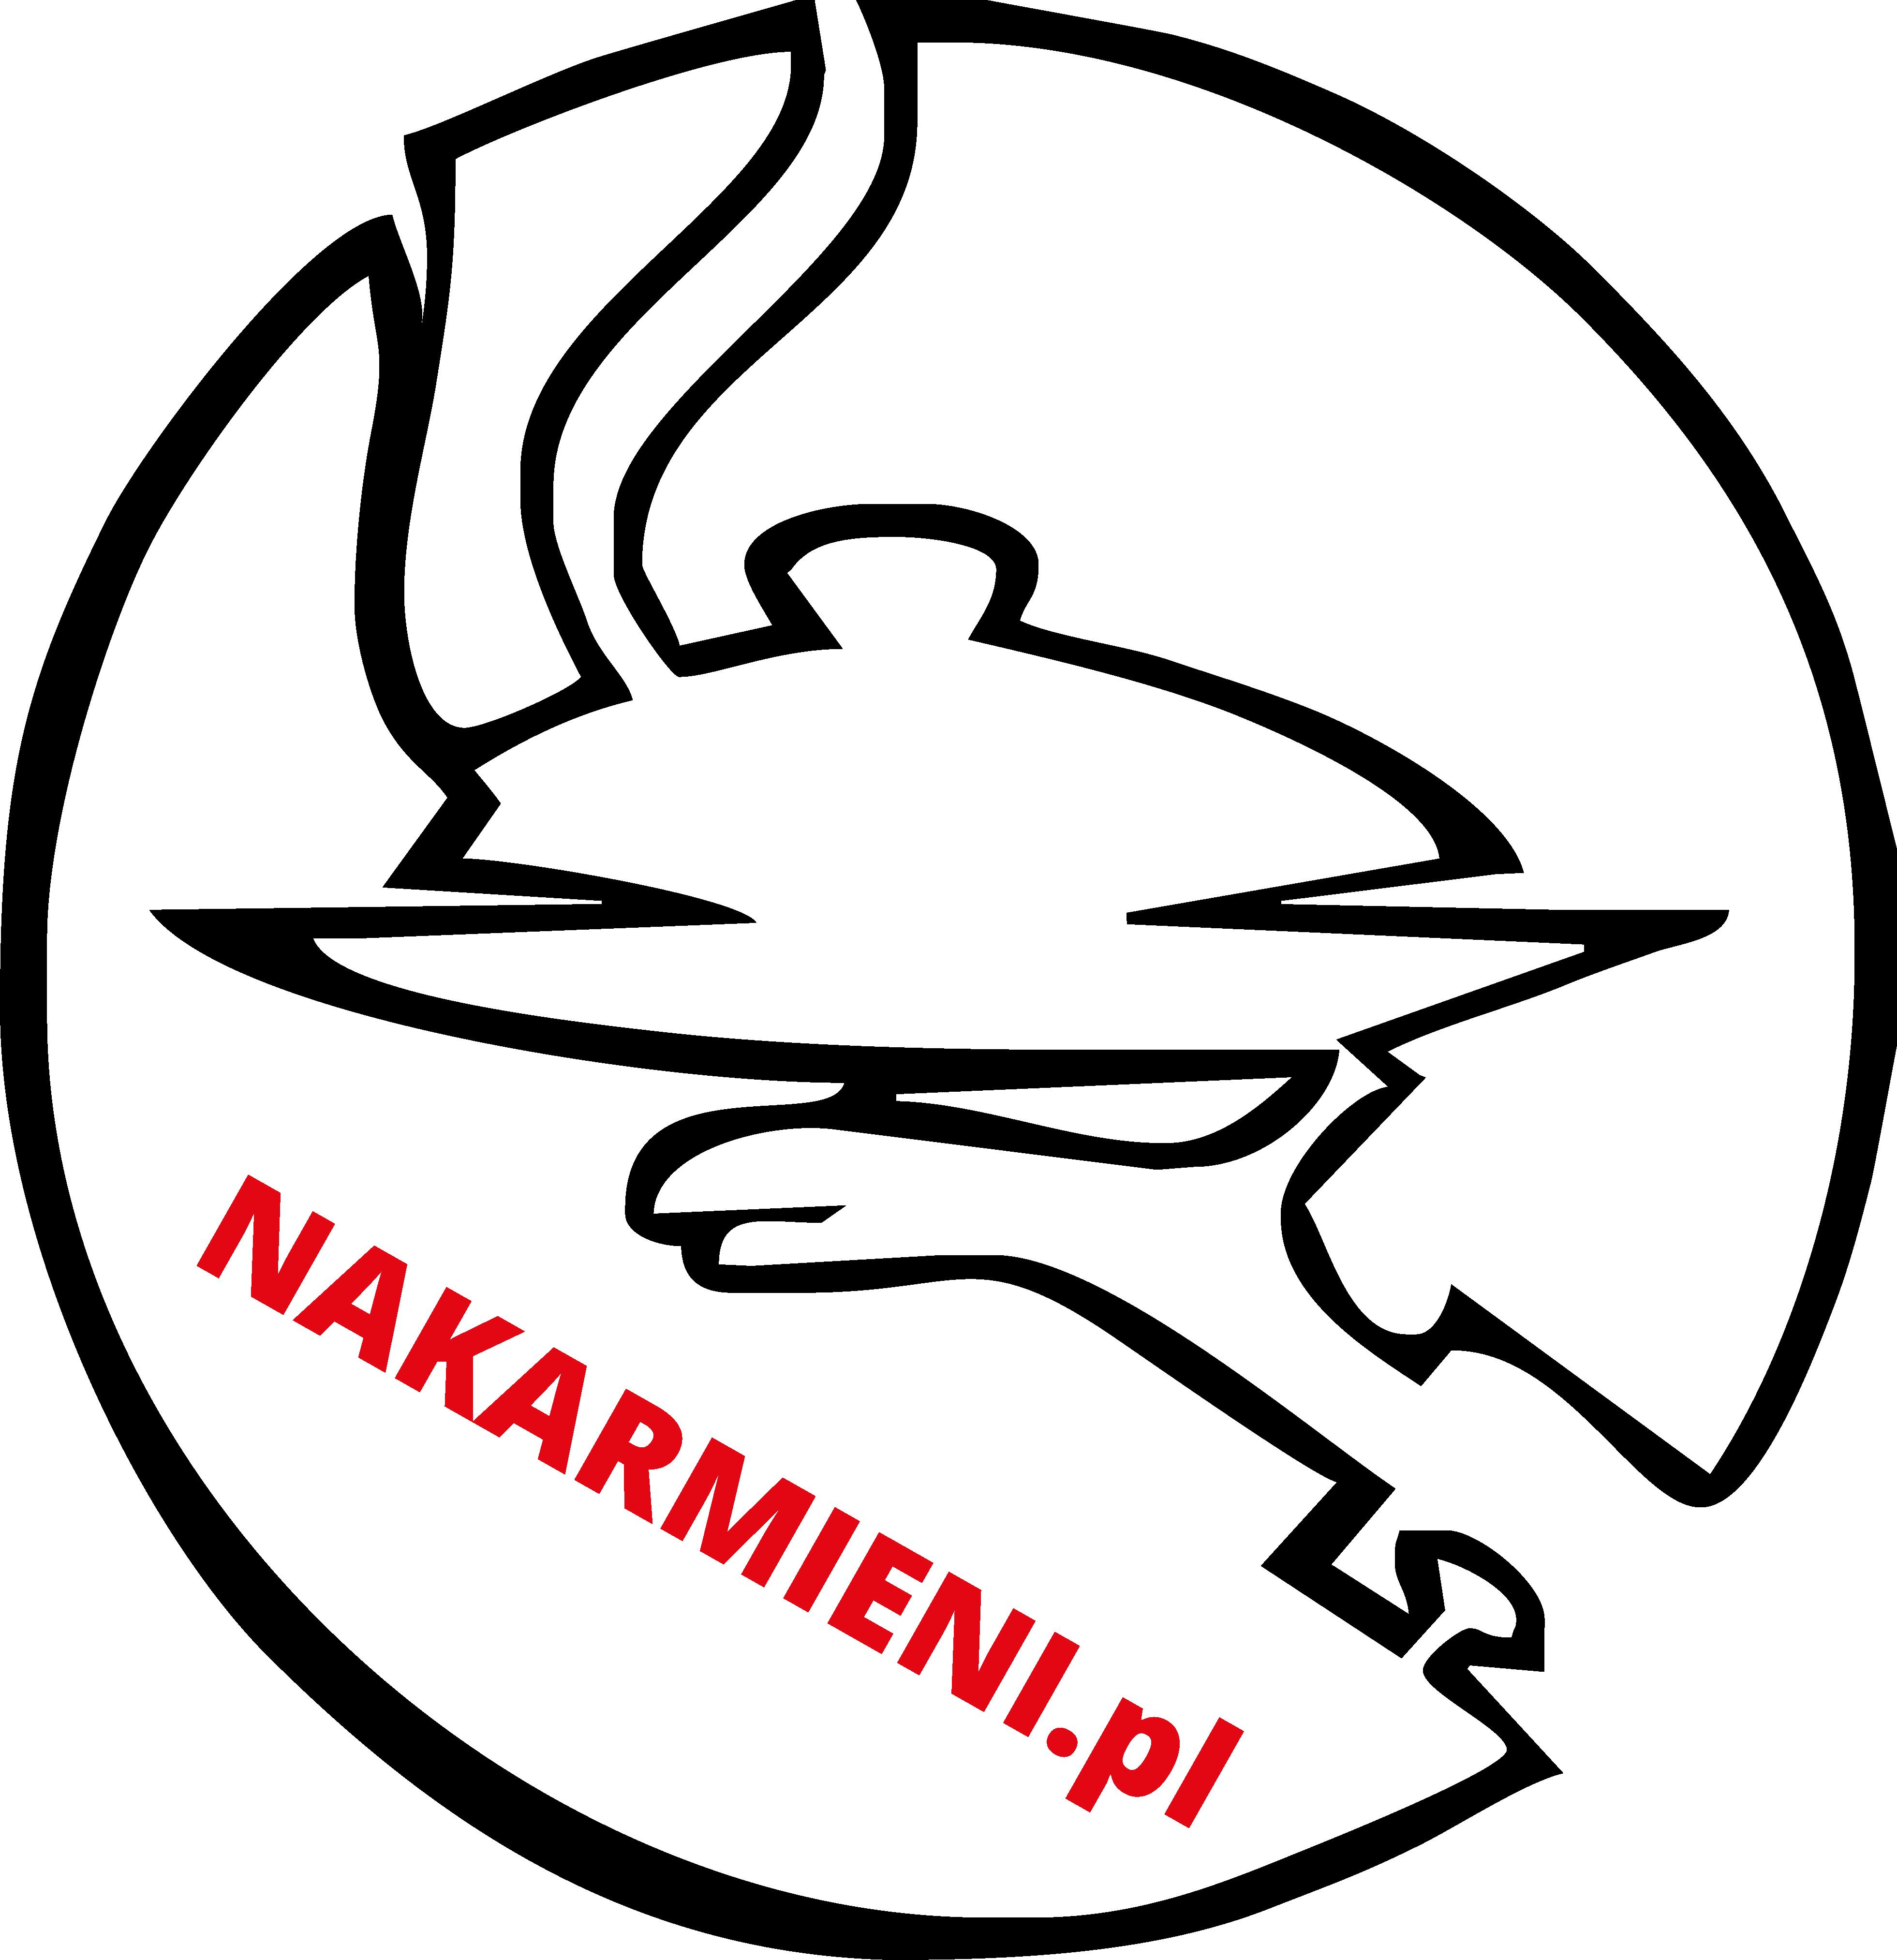 logo nakarmieni